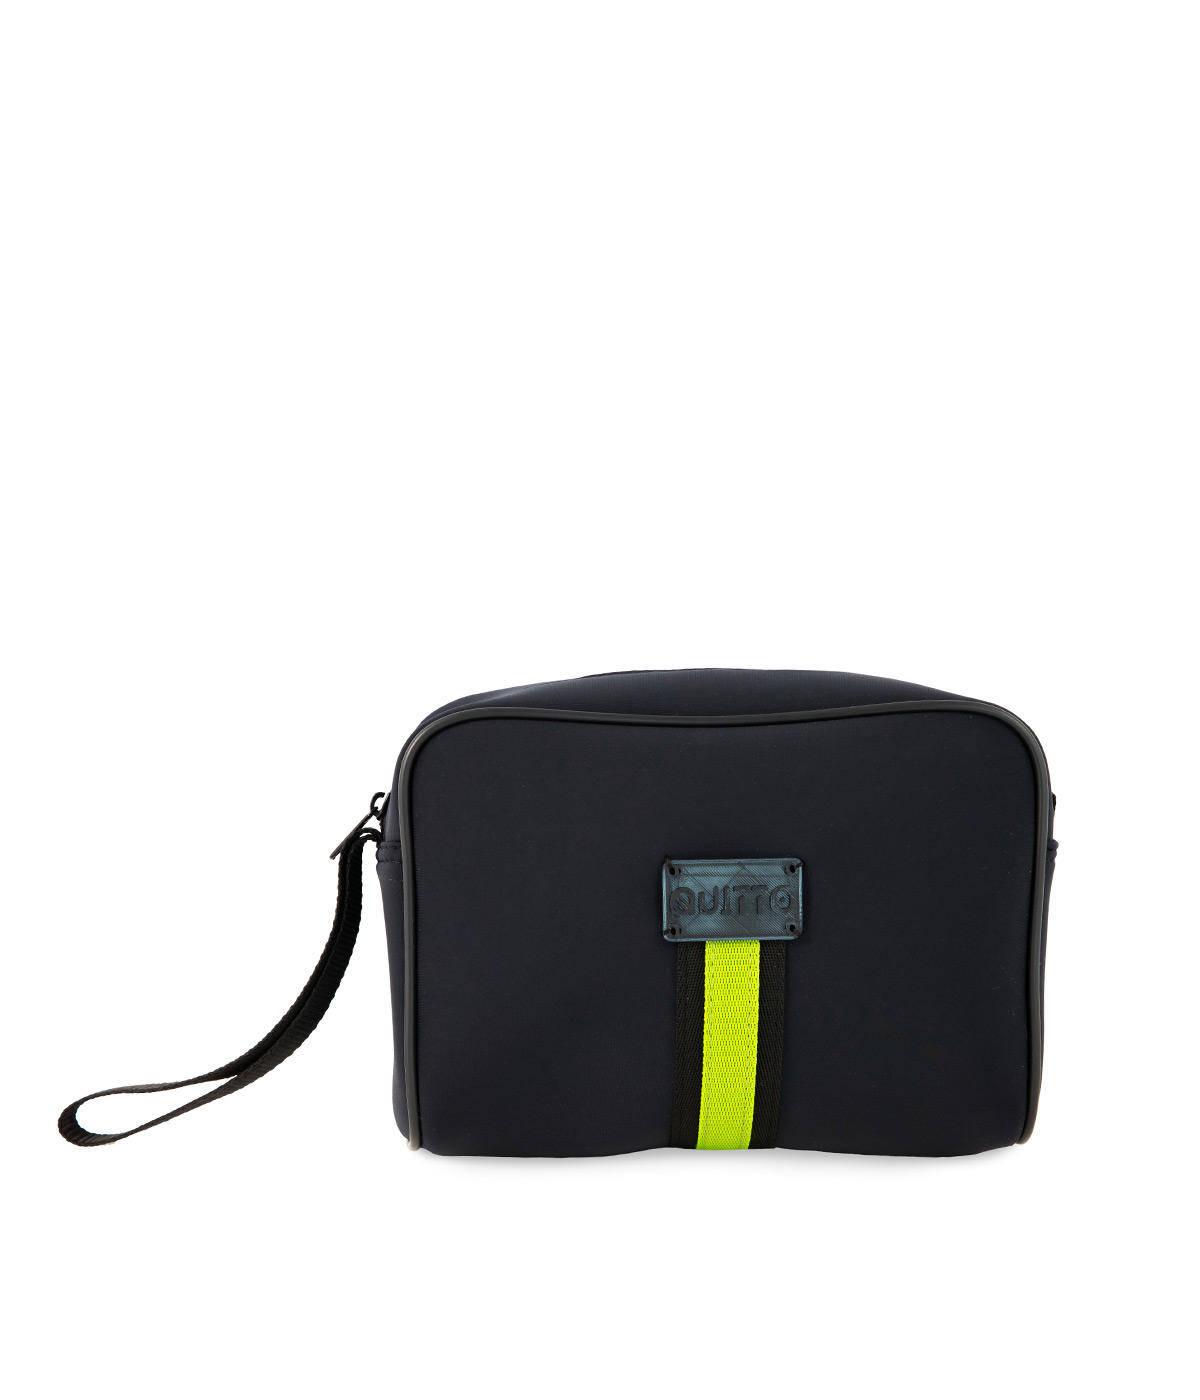 Beauty Neoprene Impermeabile Fascia Verde Quitto Bags Fronte